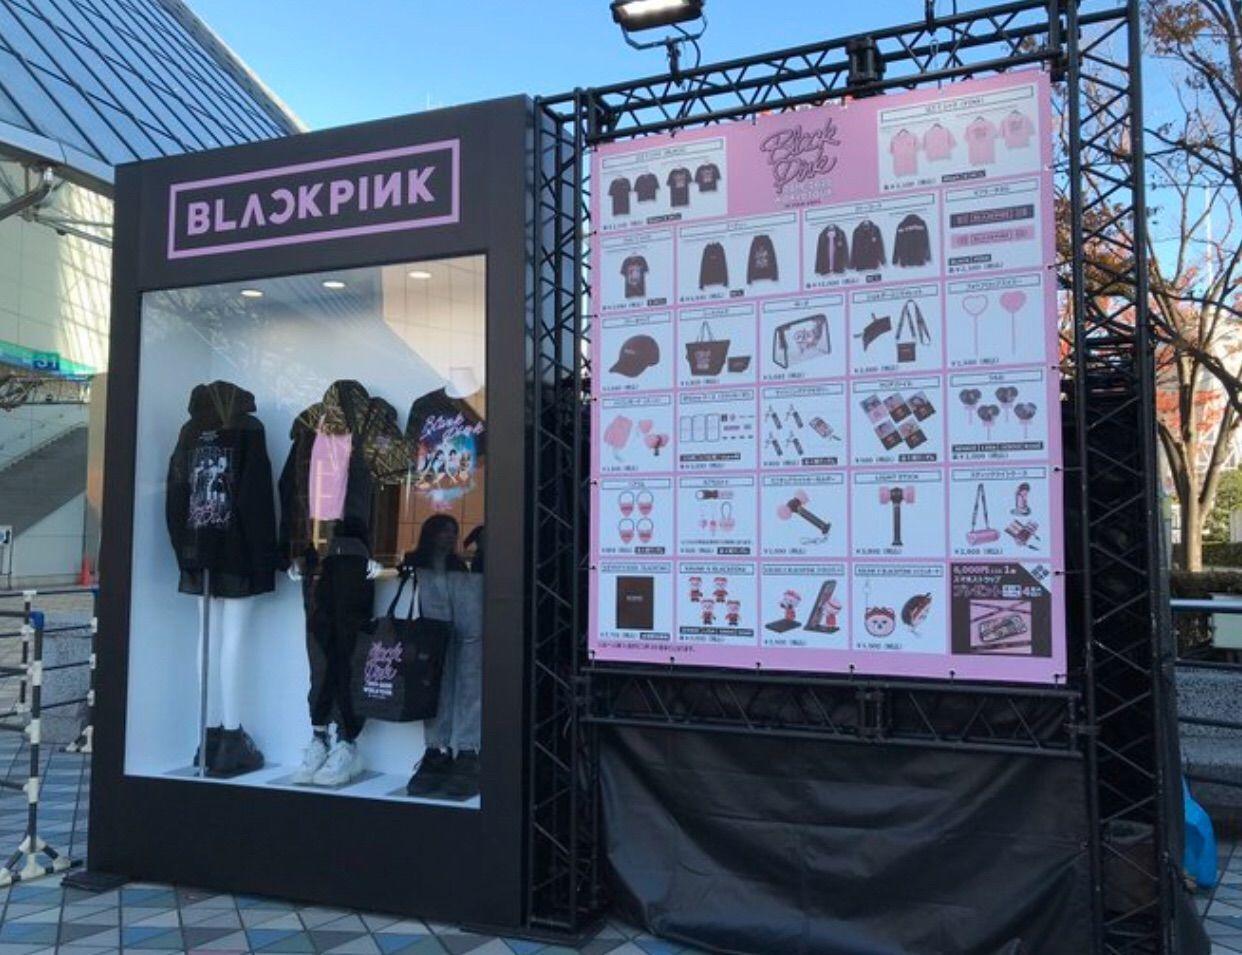 BLACKPINK 京セラドーム大阪【1/4 セトリ・グッズ列・座席